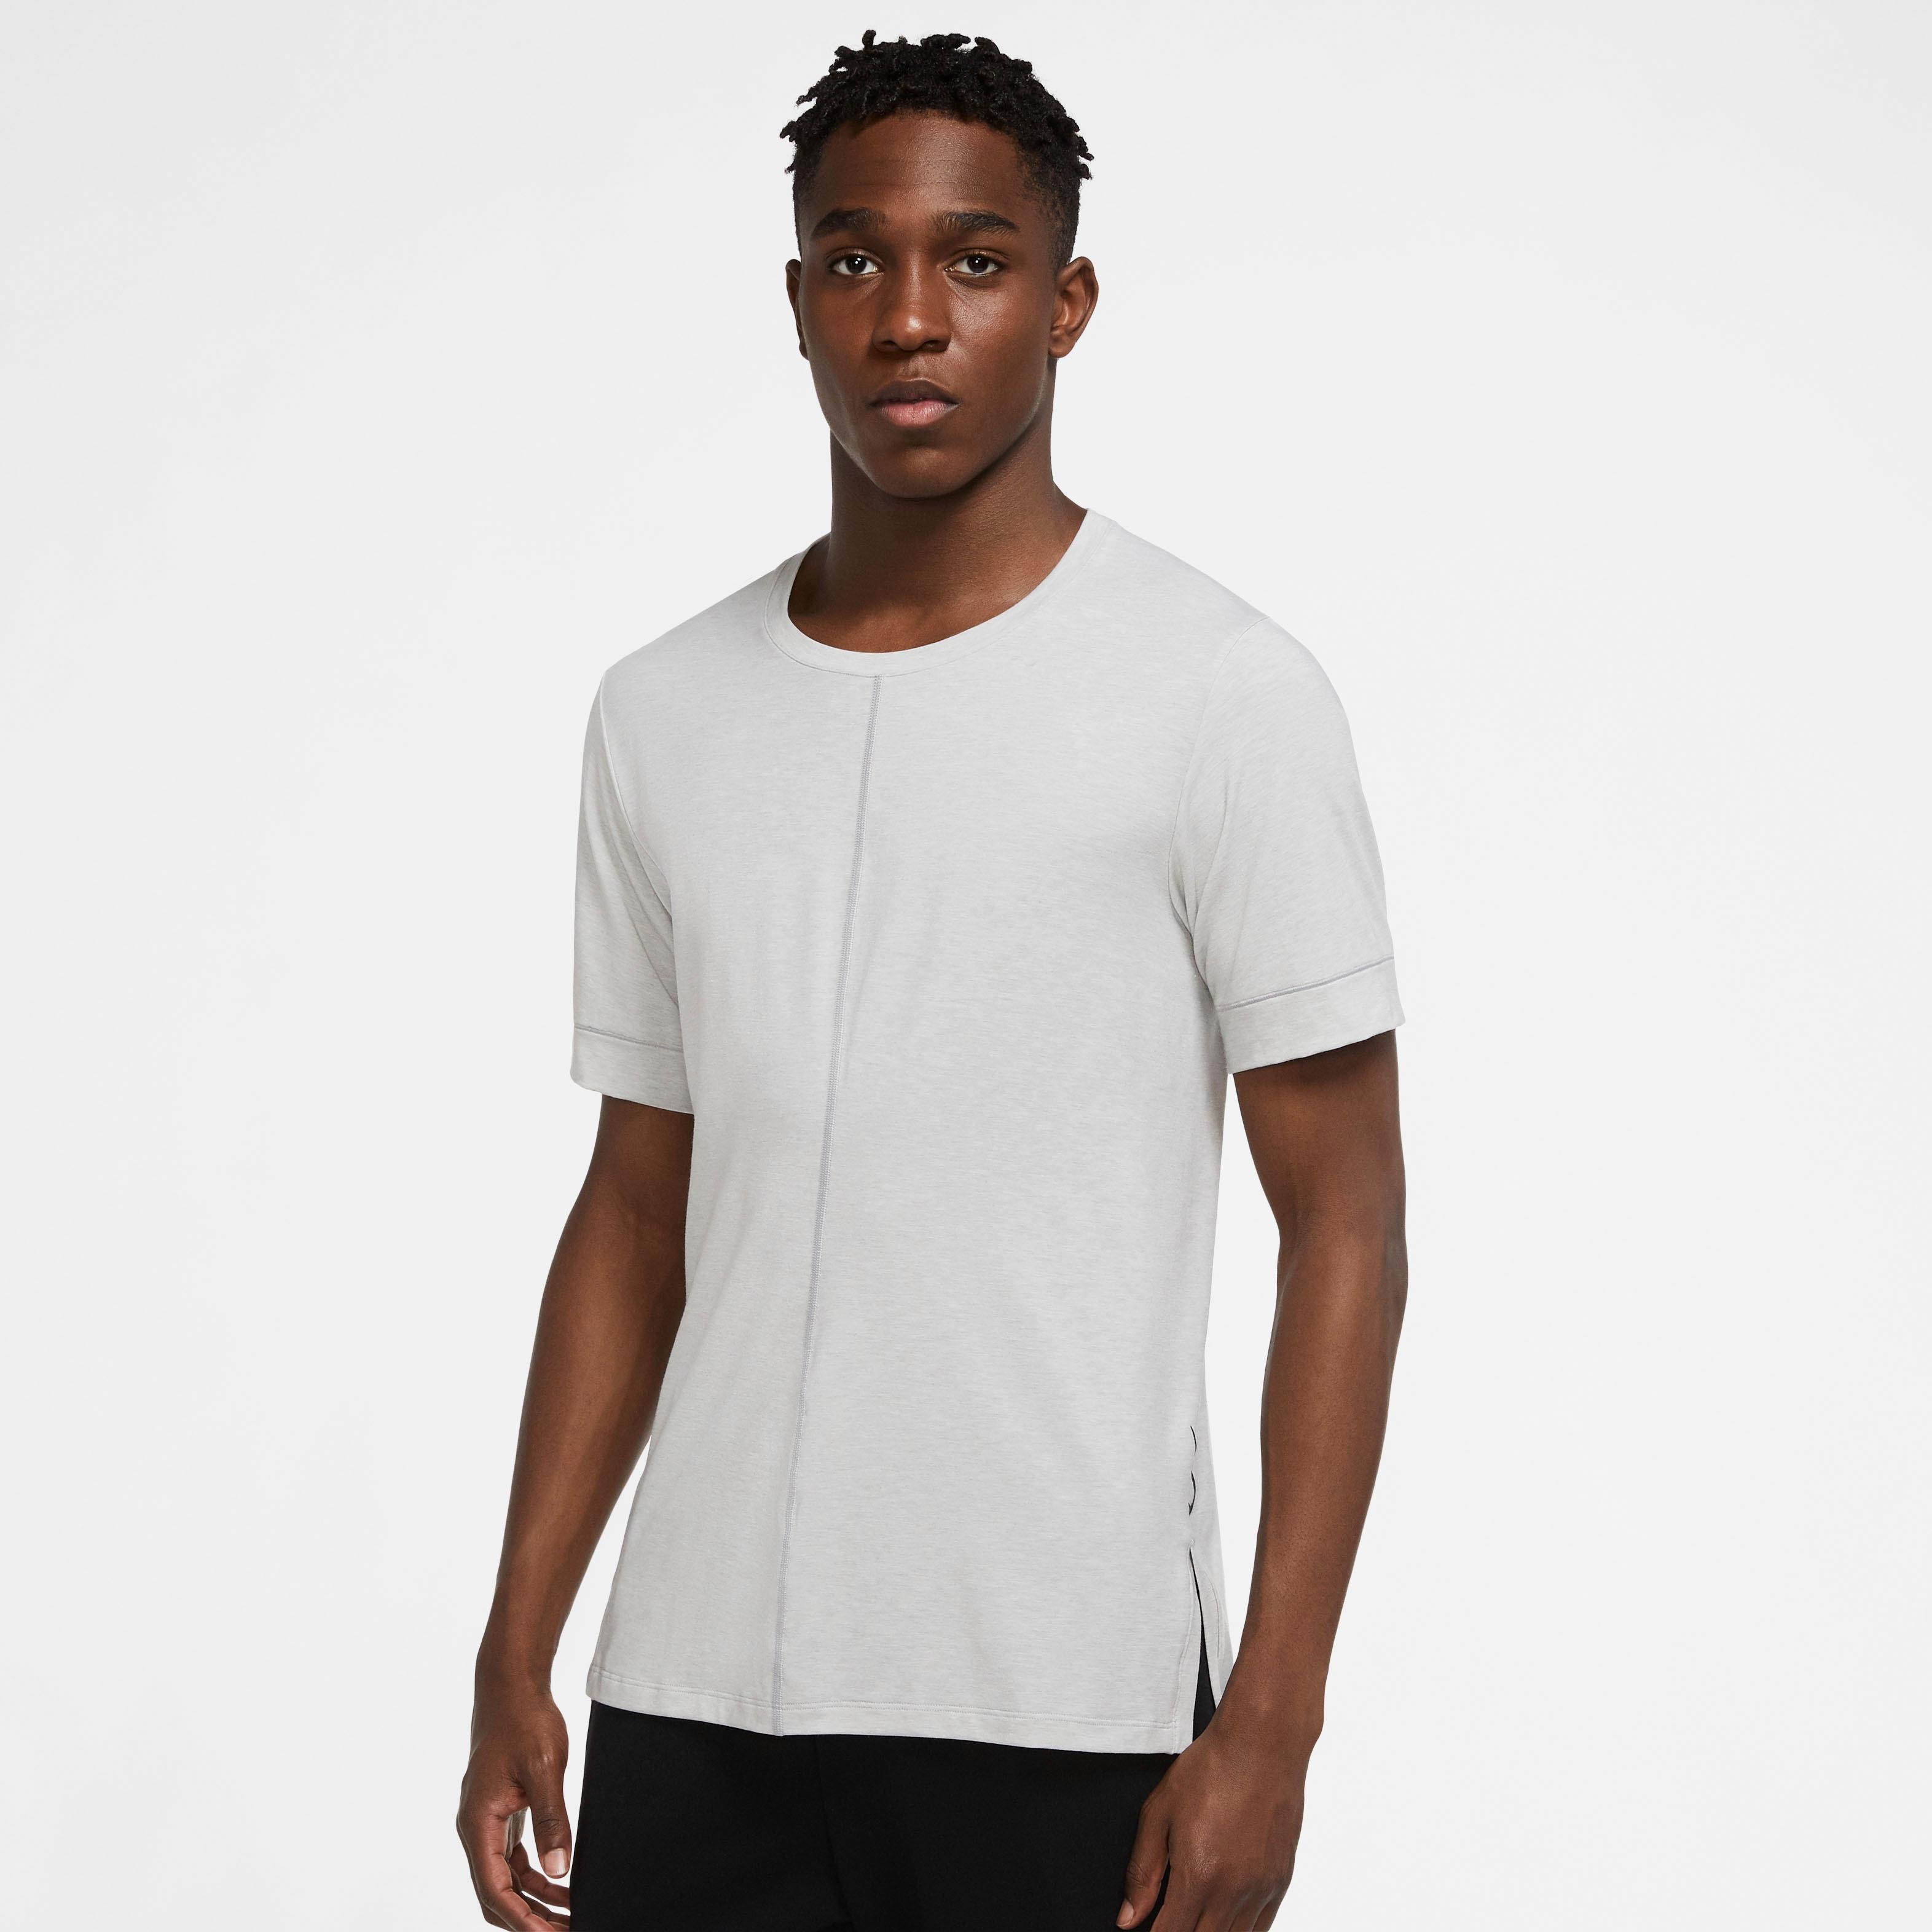 Nike Yogashirt Dri-FIT Men's Yoga Training Top grau Herren